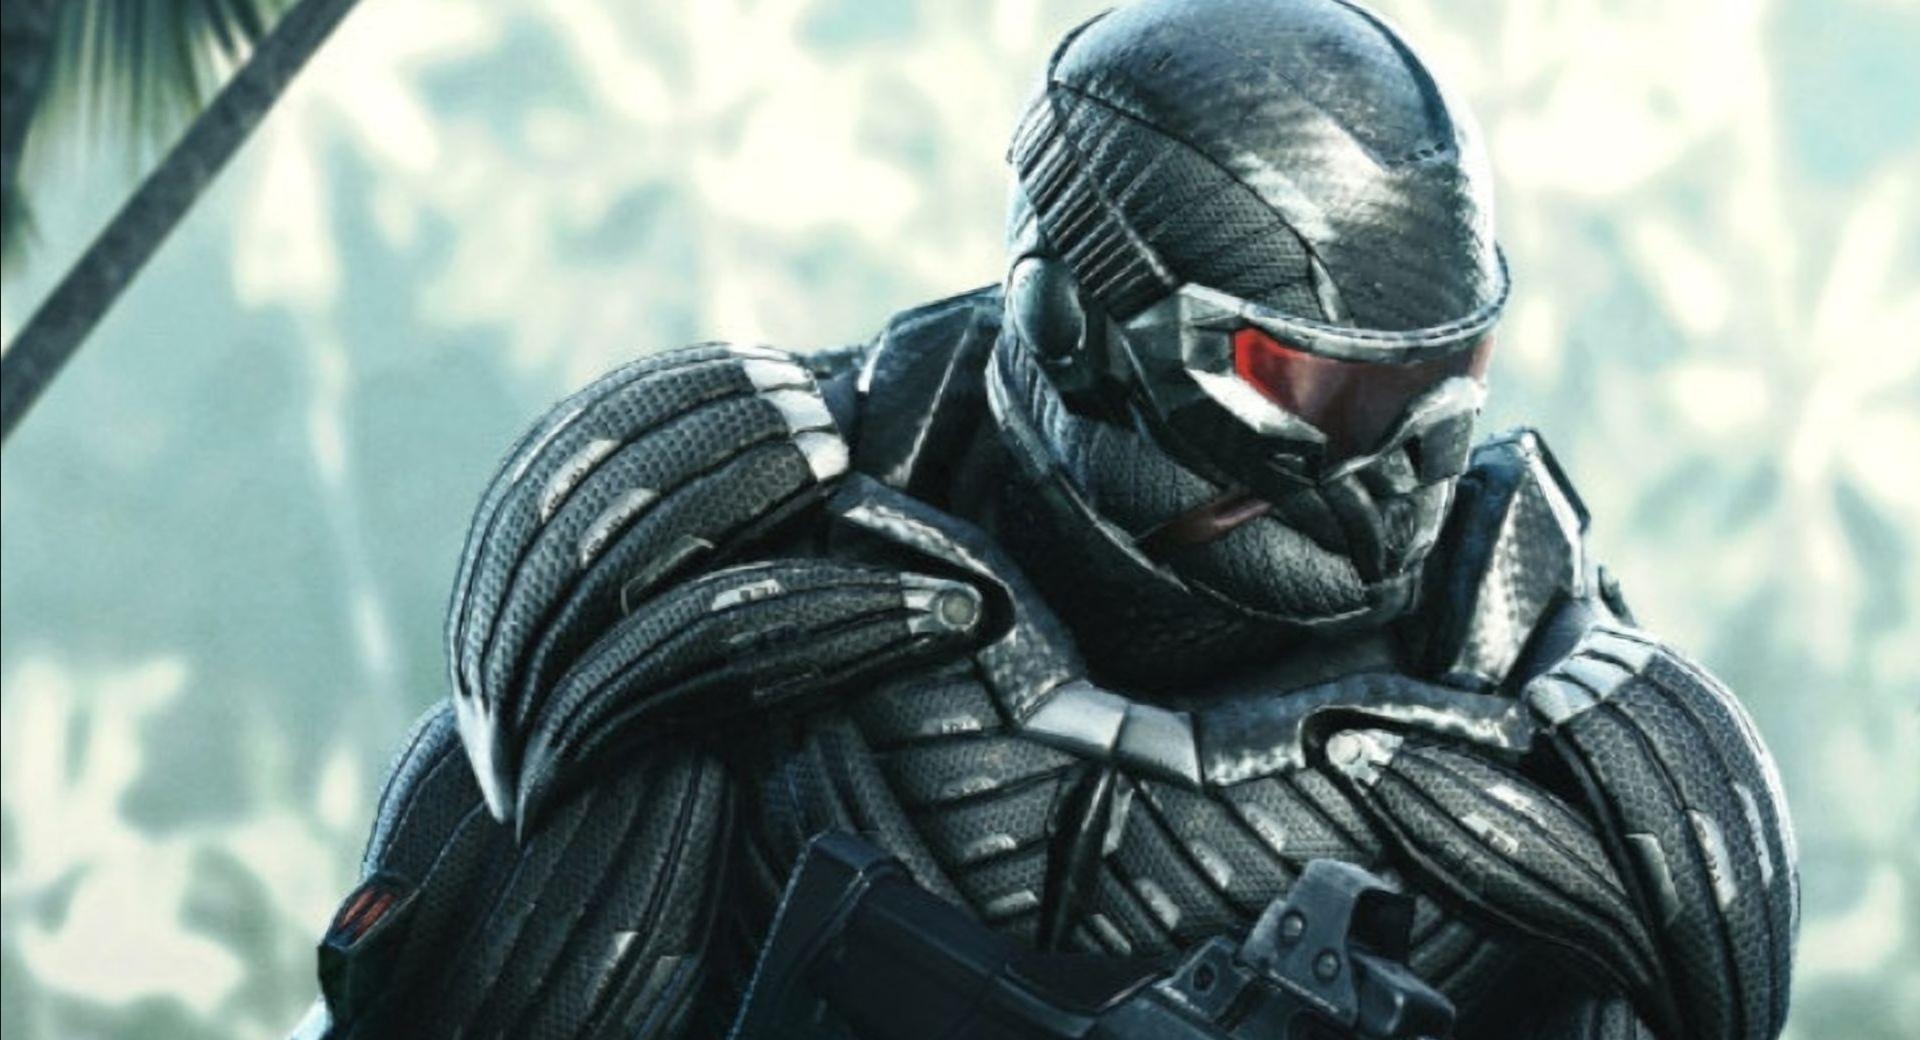 Crysis Remastered podporuje Ray-Tracing i na současných konzolích